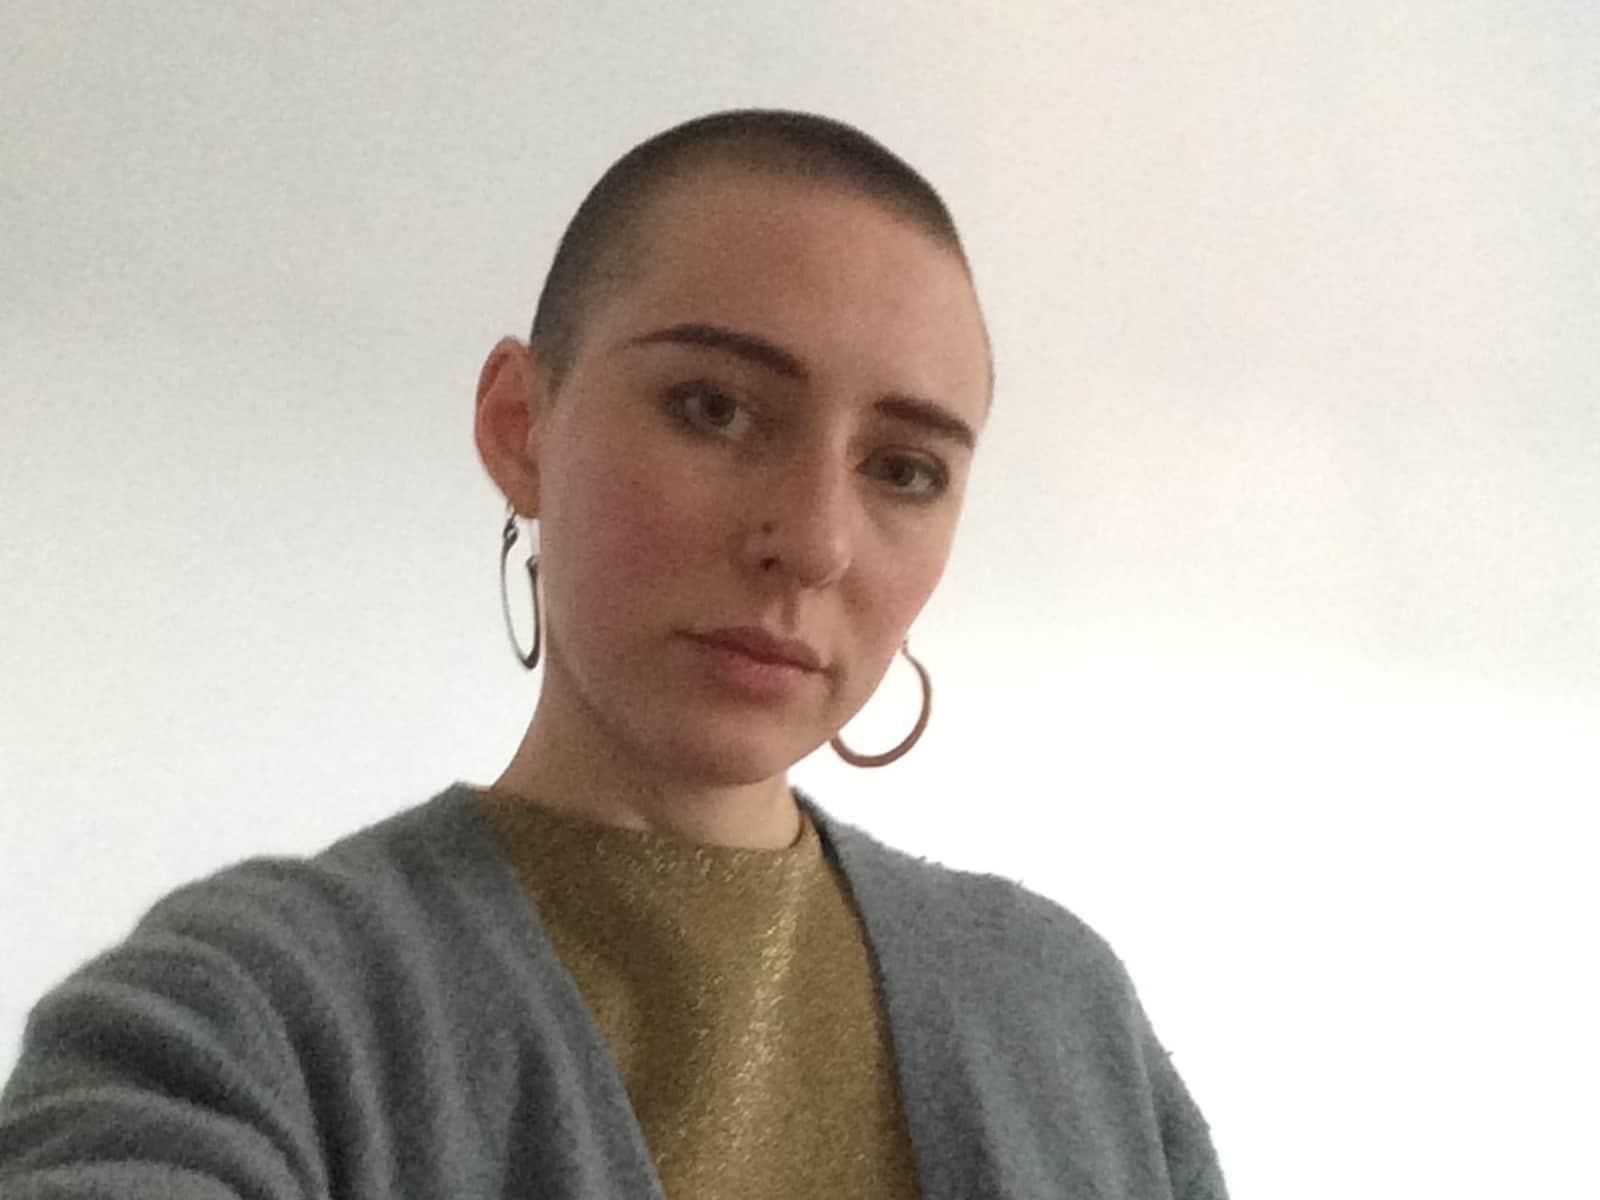 Kristen from Seattle, Washington, United States